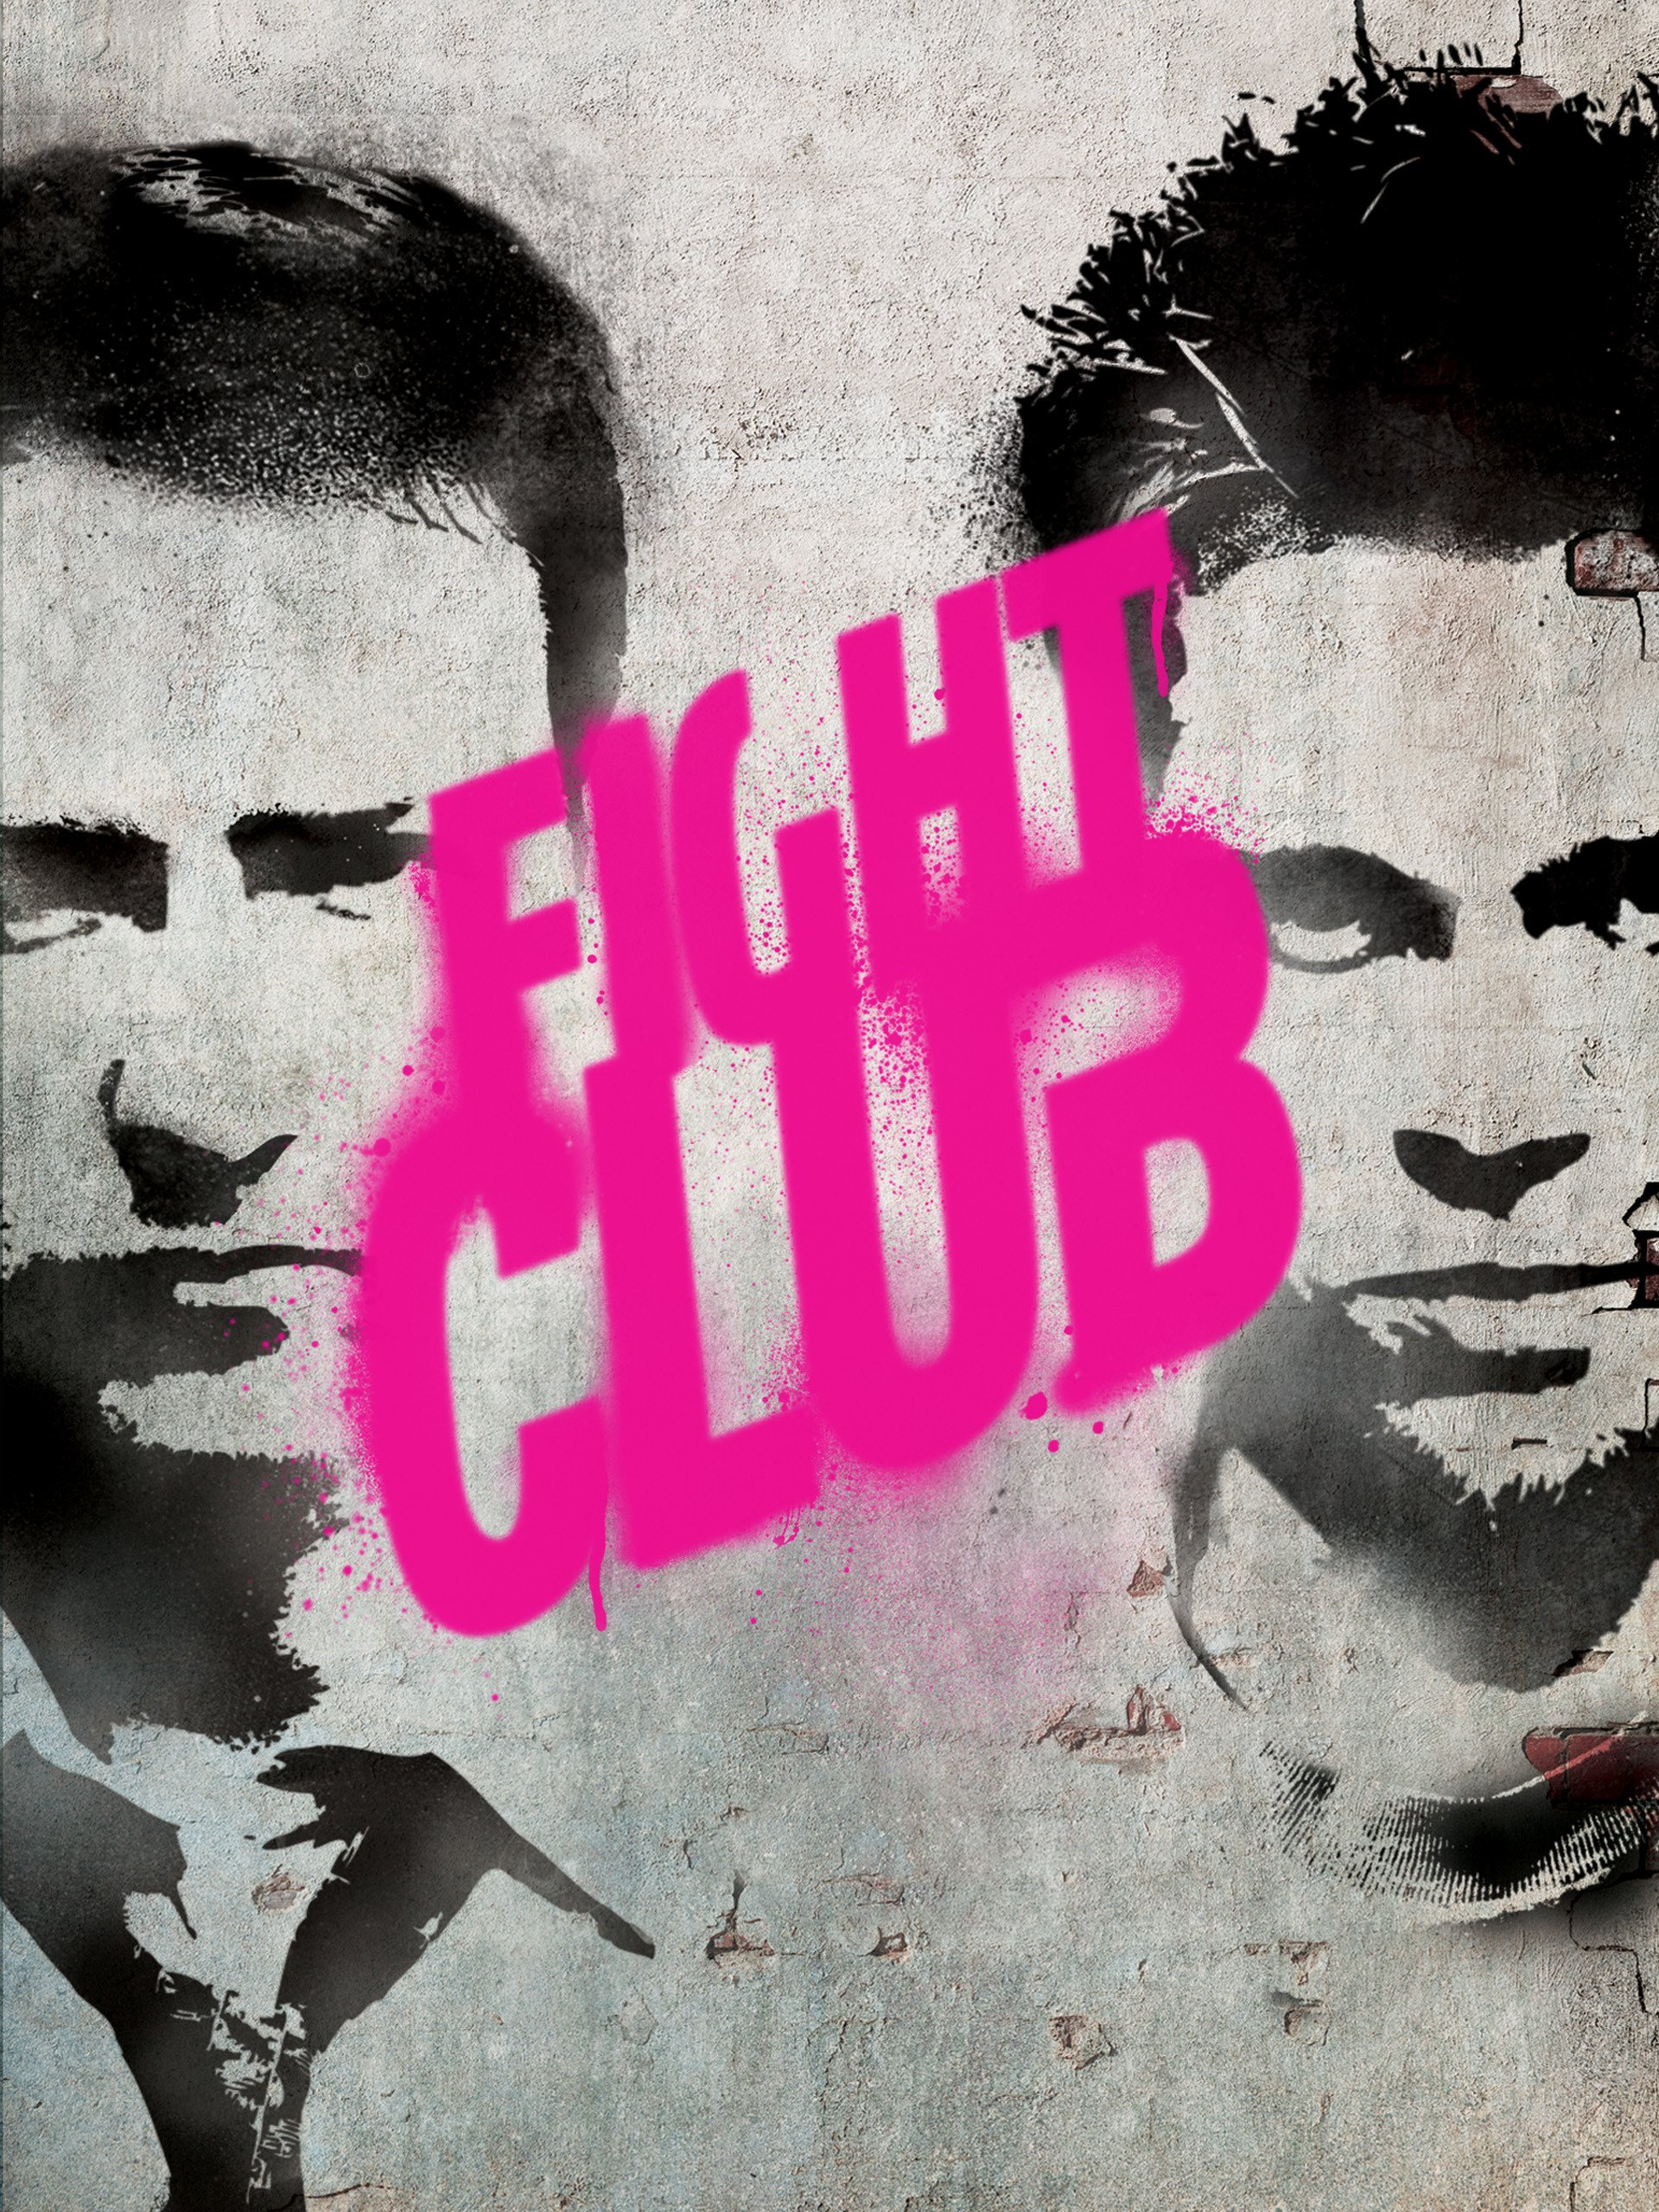 Designer deals club for hancock - Amazon Com Fight Club Brad Pitt Edward Norton Helena Bonham Carter 20th_century_fox Amazon Digital Services Llc